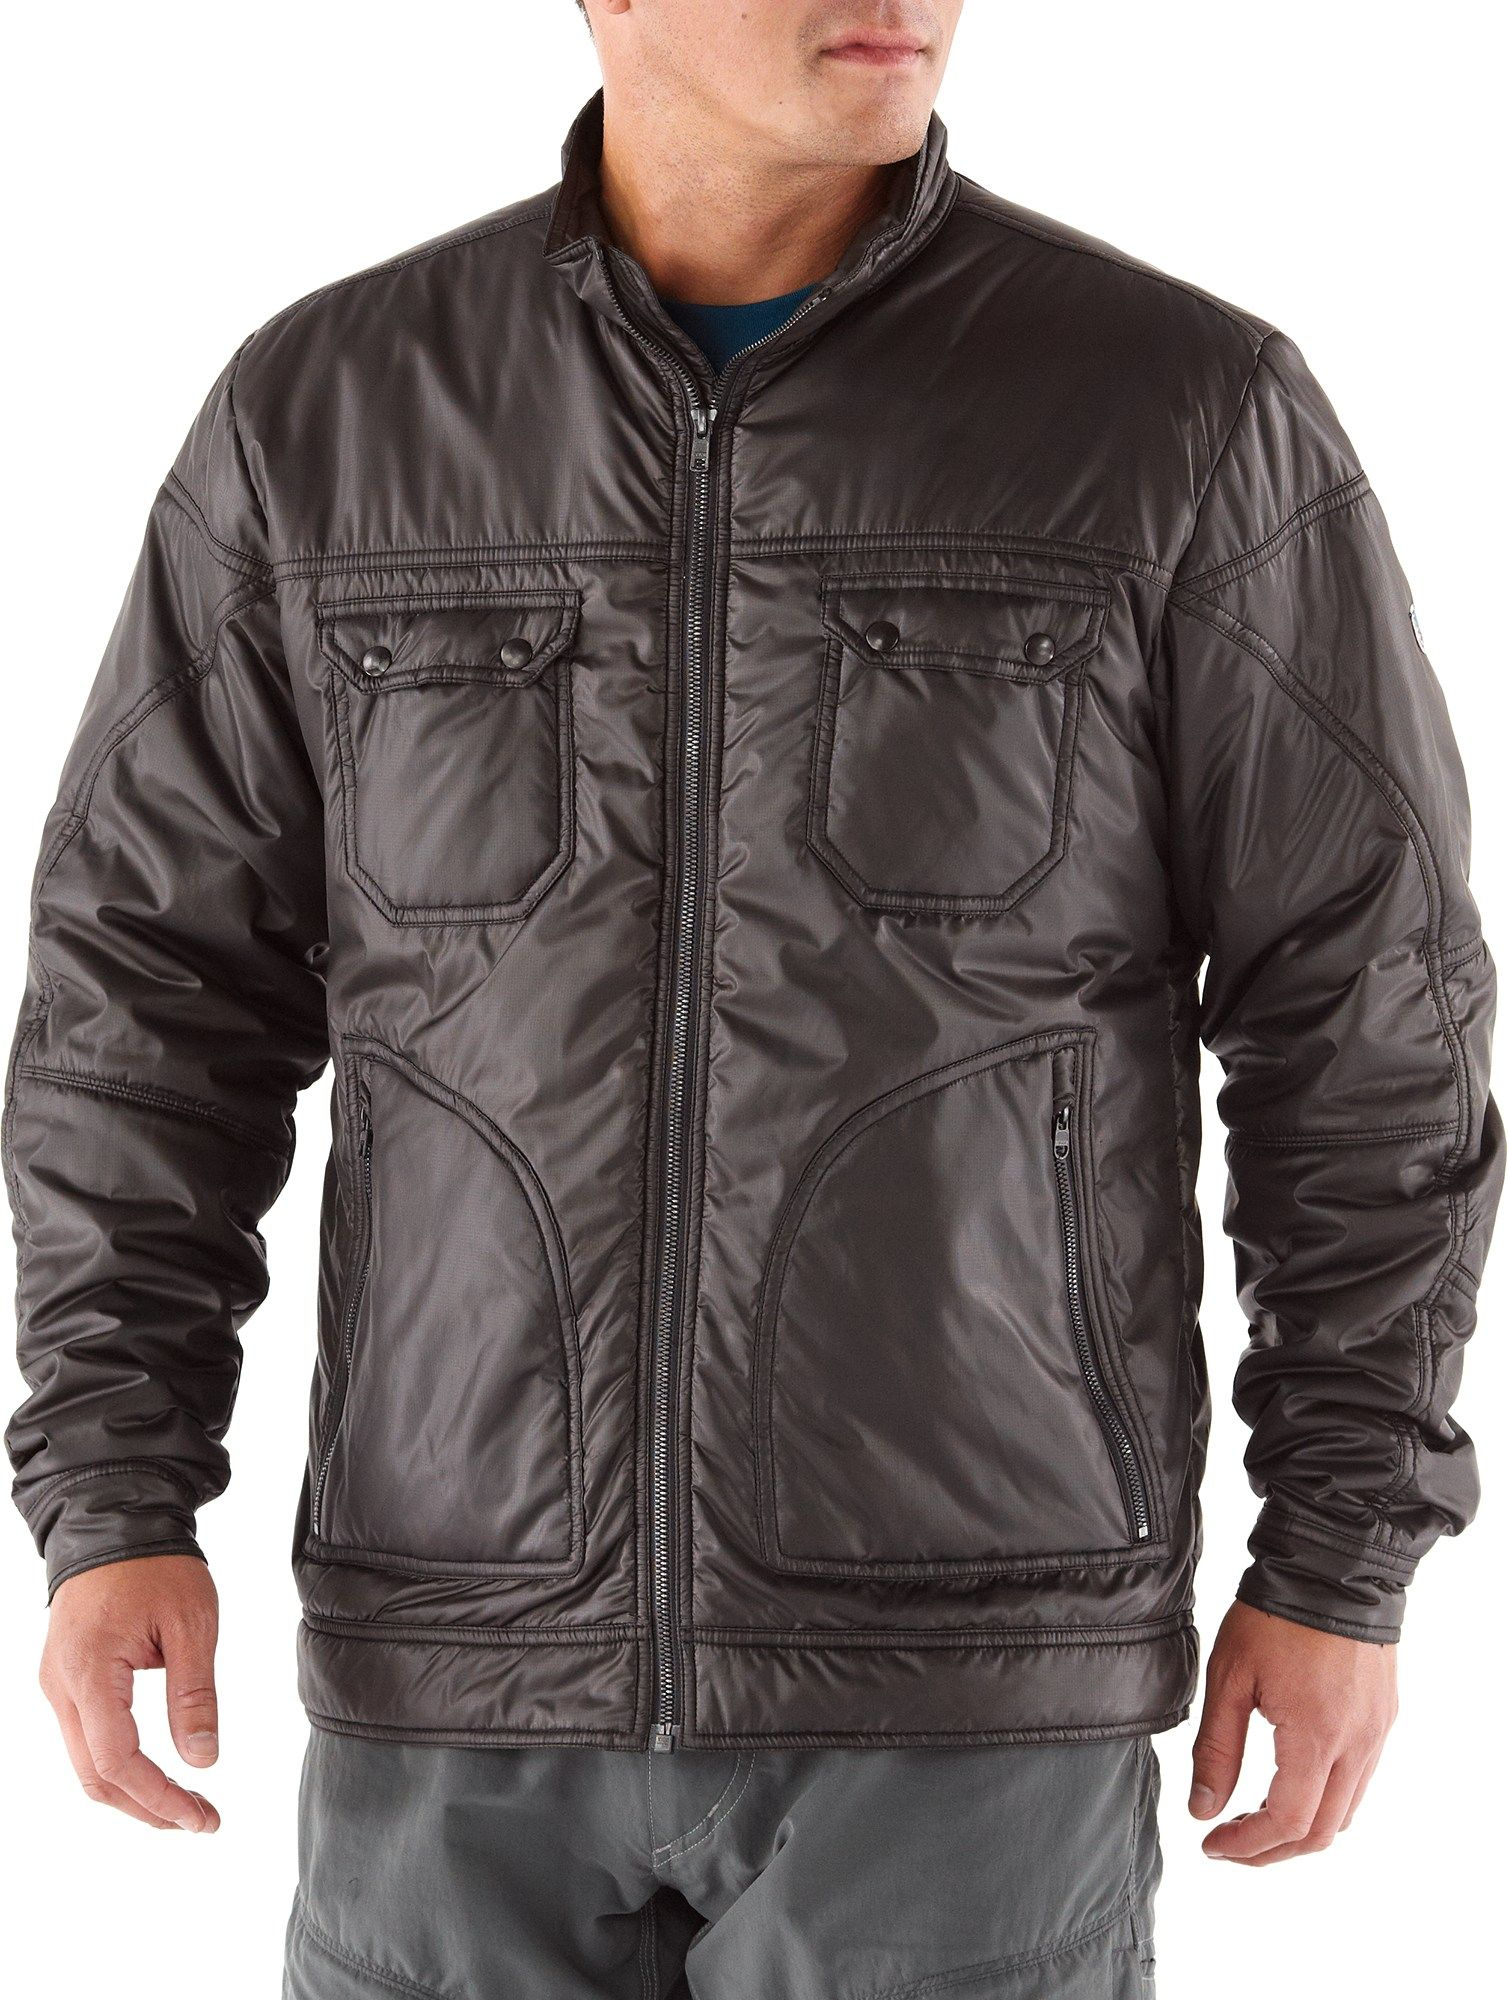 KUHL Revolt Jacket - Men's | REI Co-op | Men's Style ...